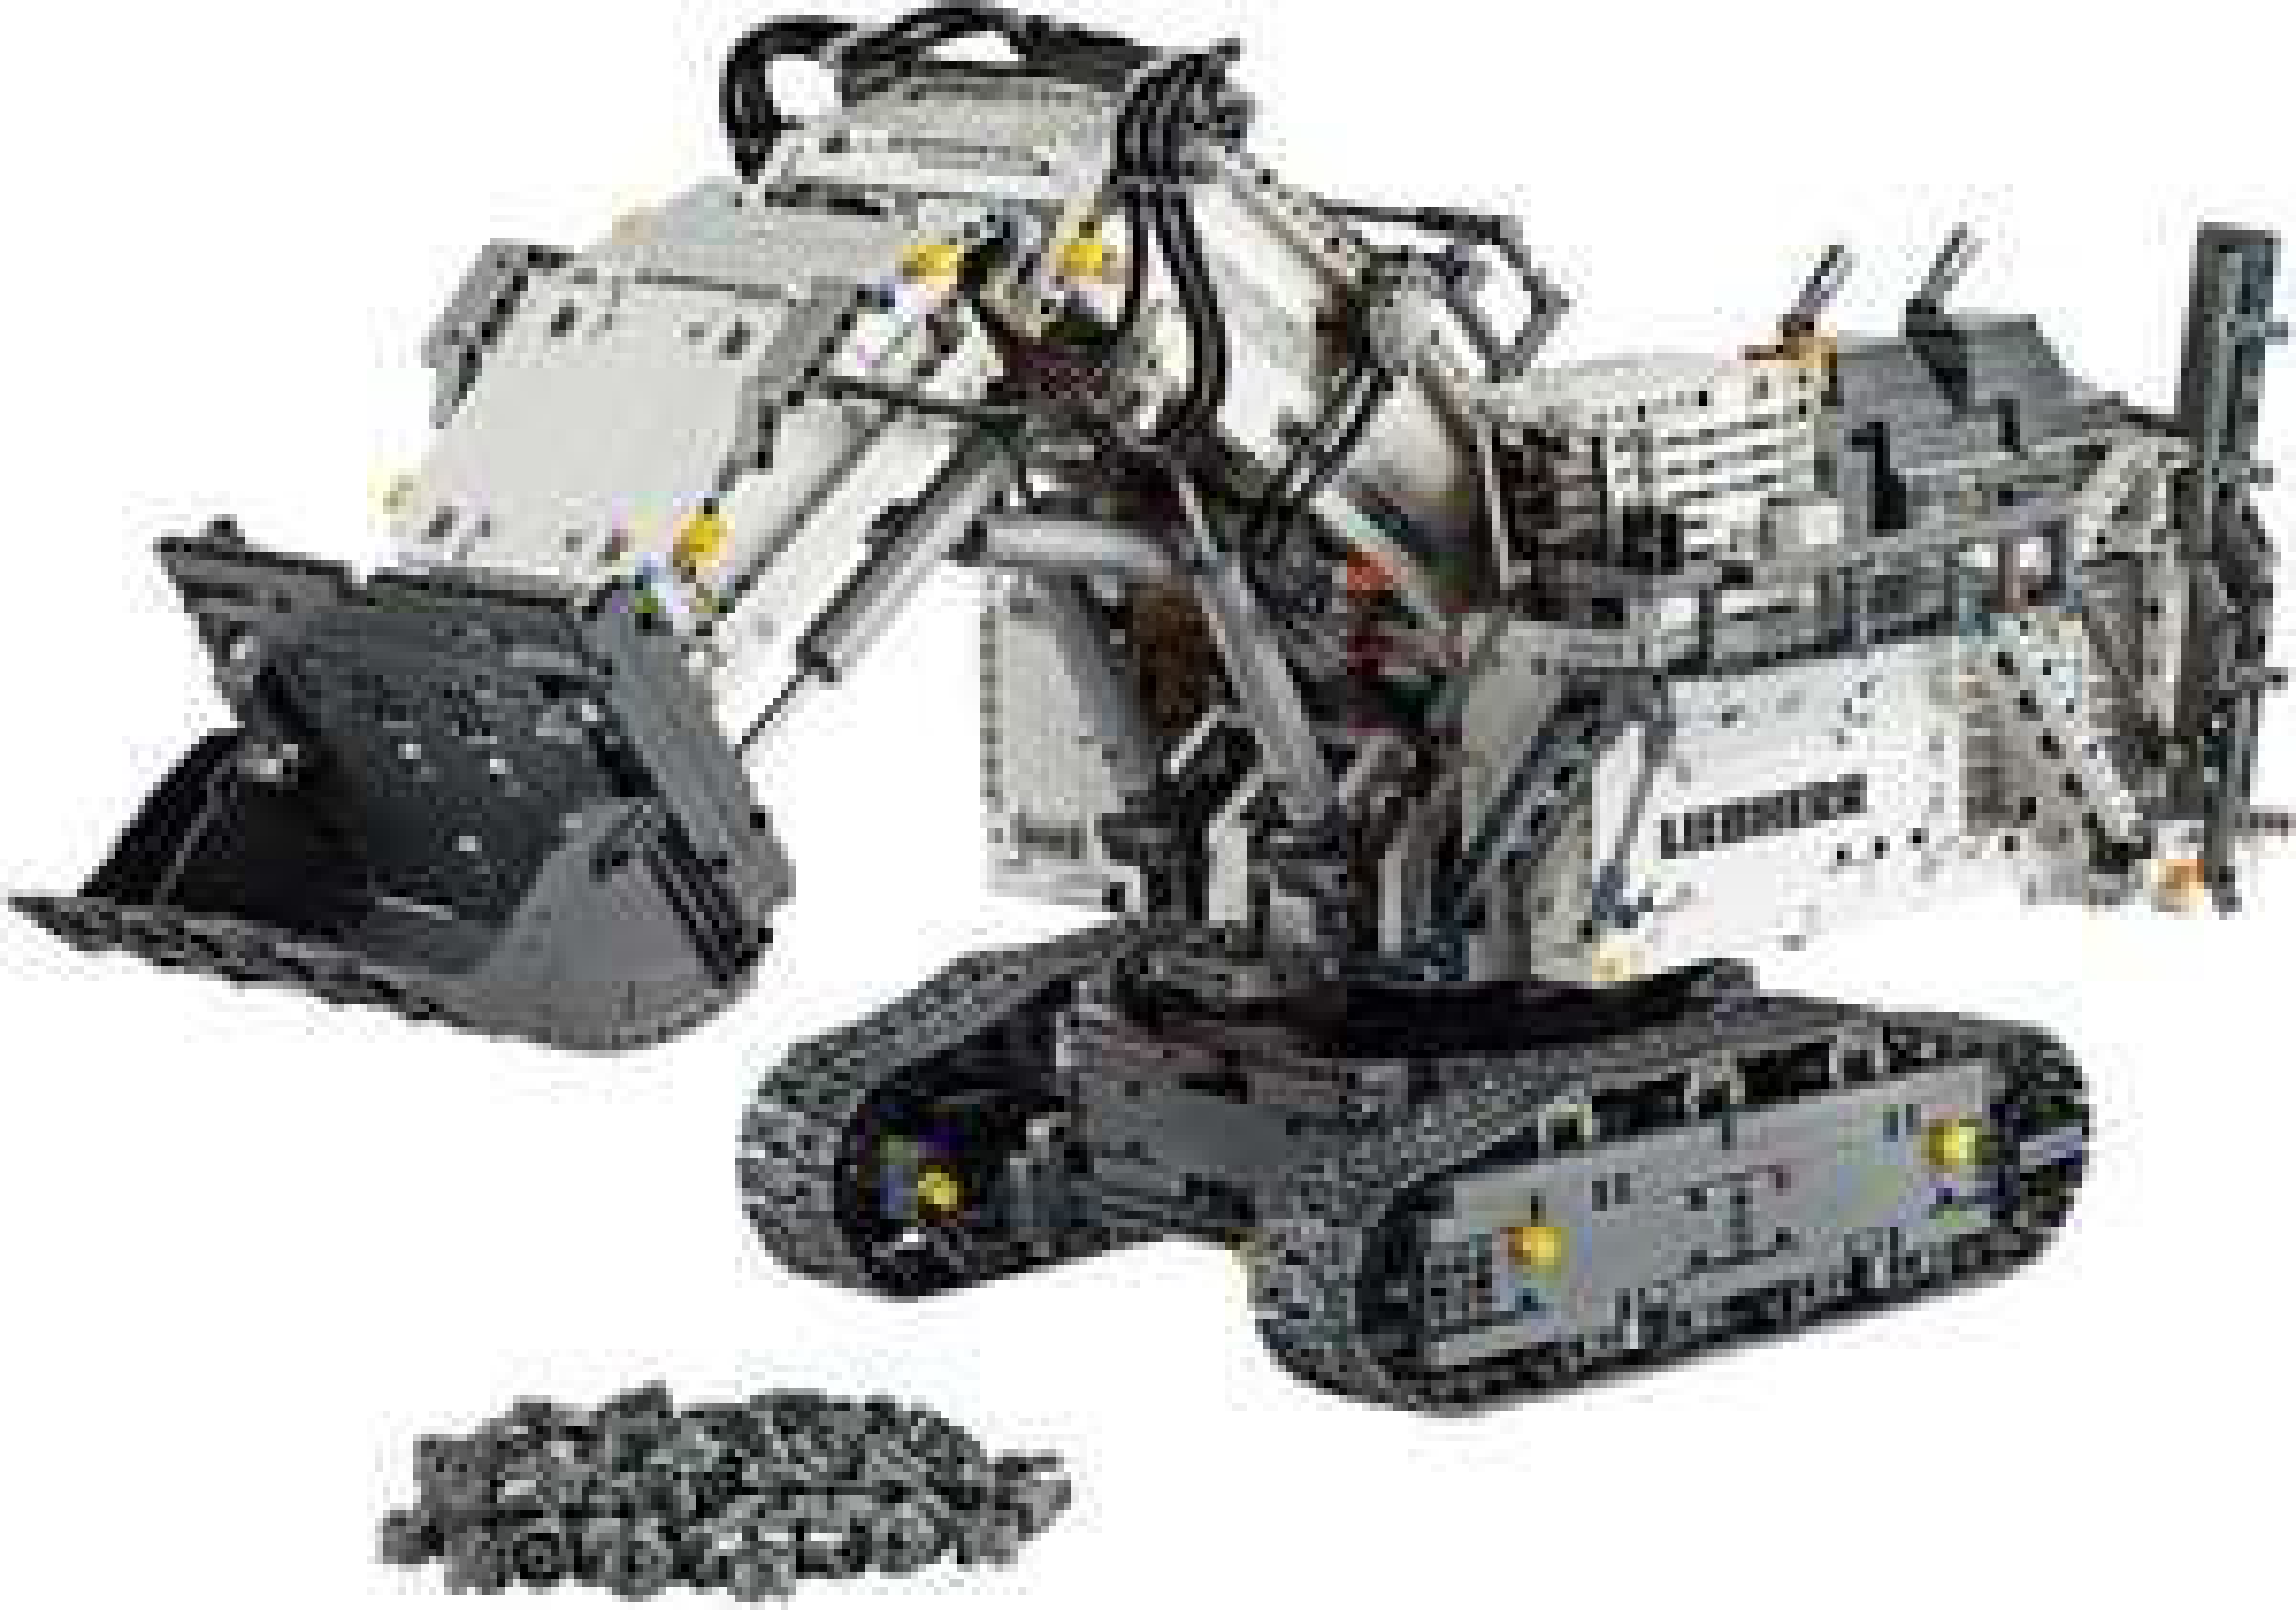 Black Friday LEGO Deal: Goedkoopste LEGO Liebherr R 9800 Graafmachine tot nu toe - 42100